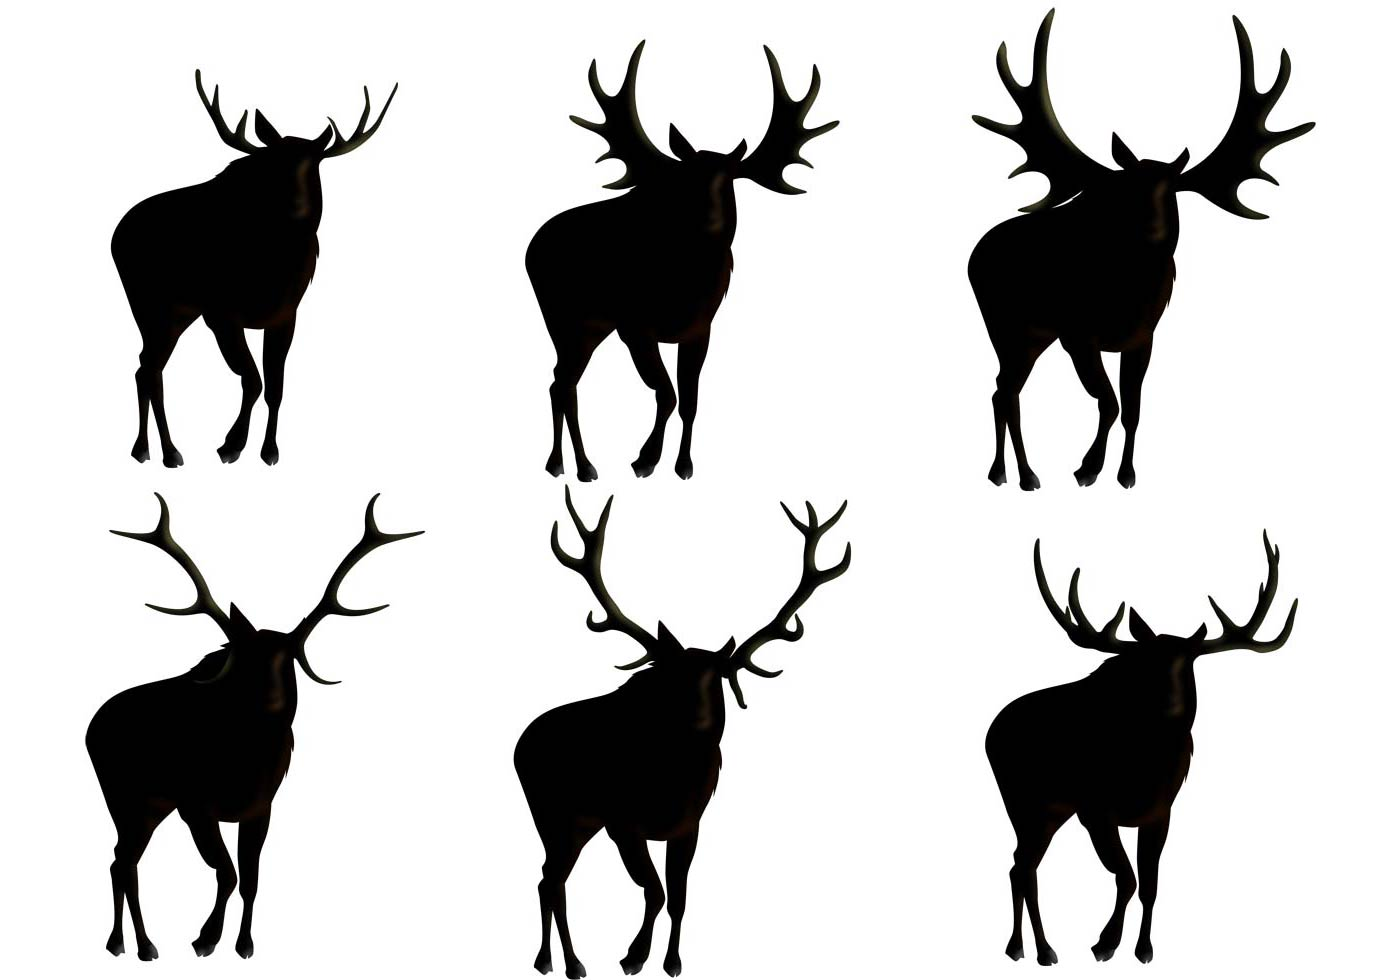 1400x980 Moose Silhouette Vectors